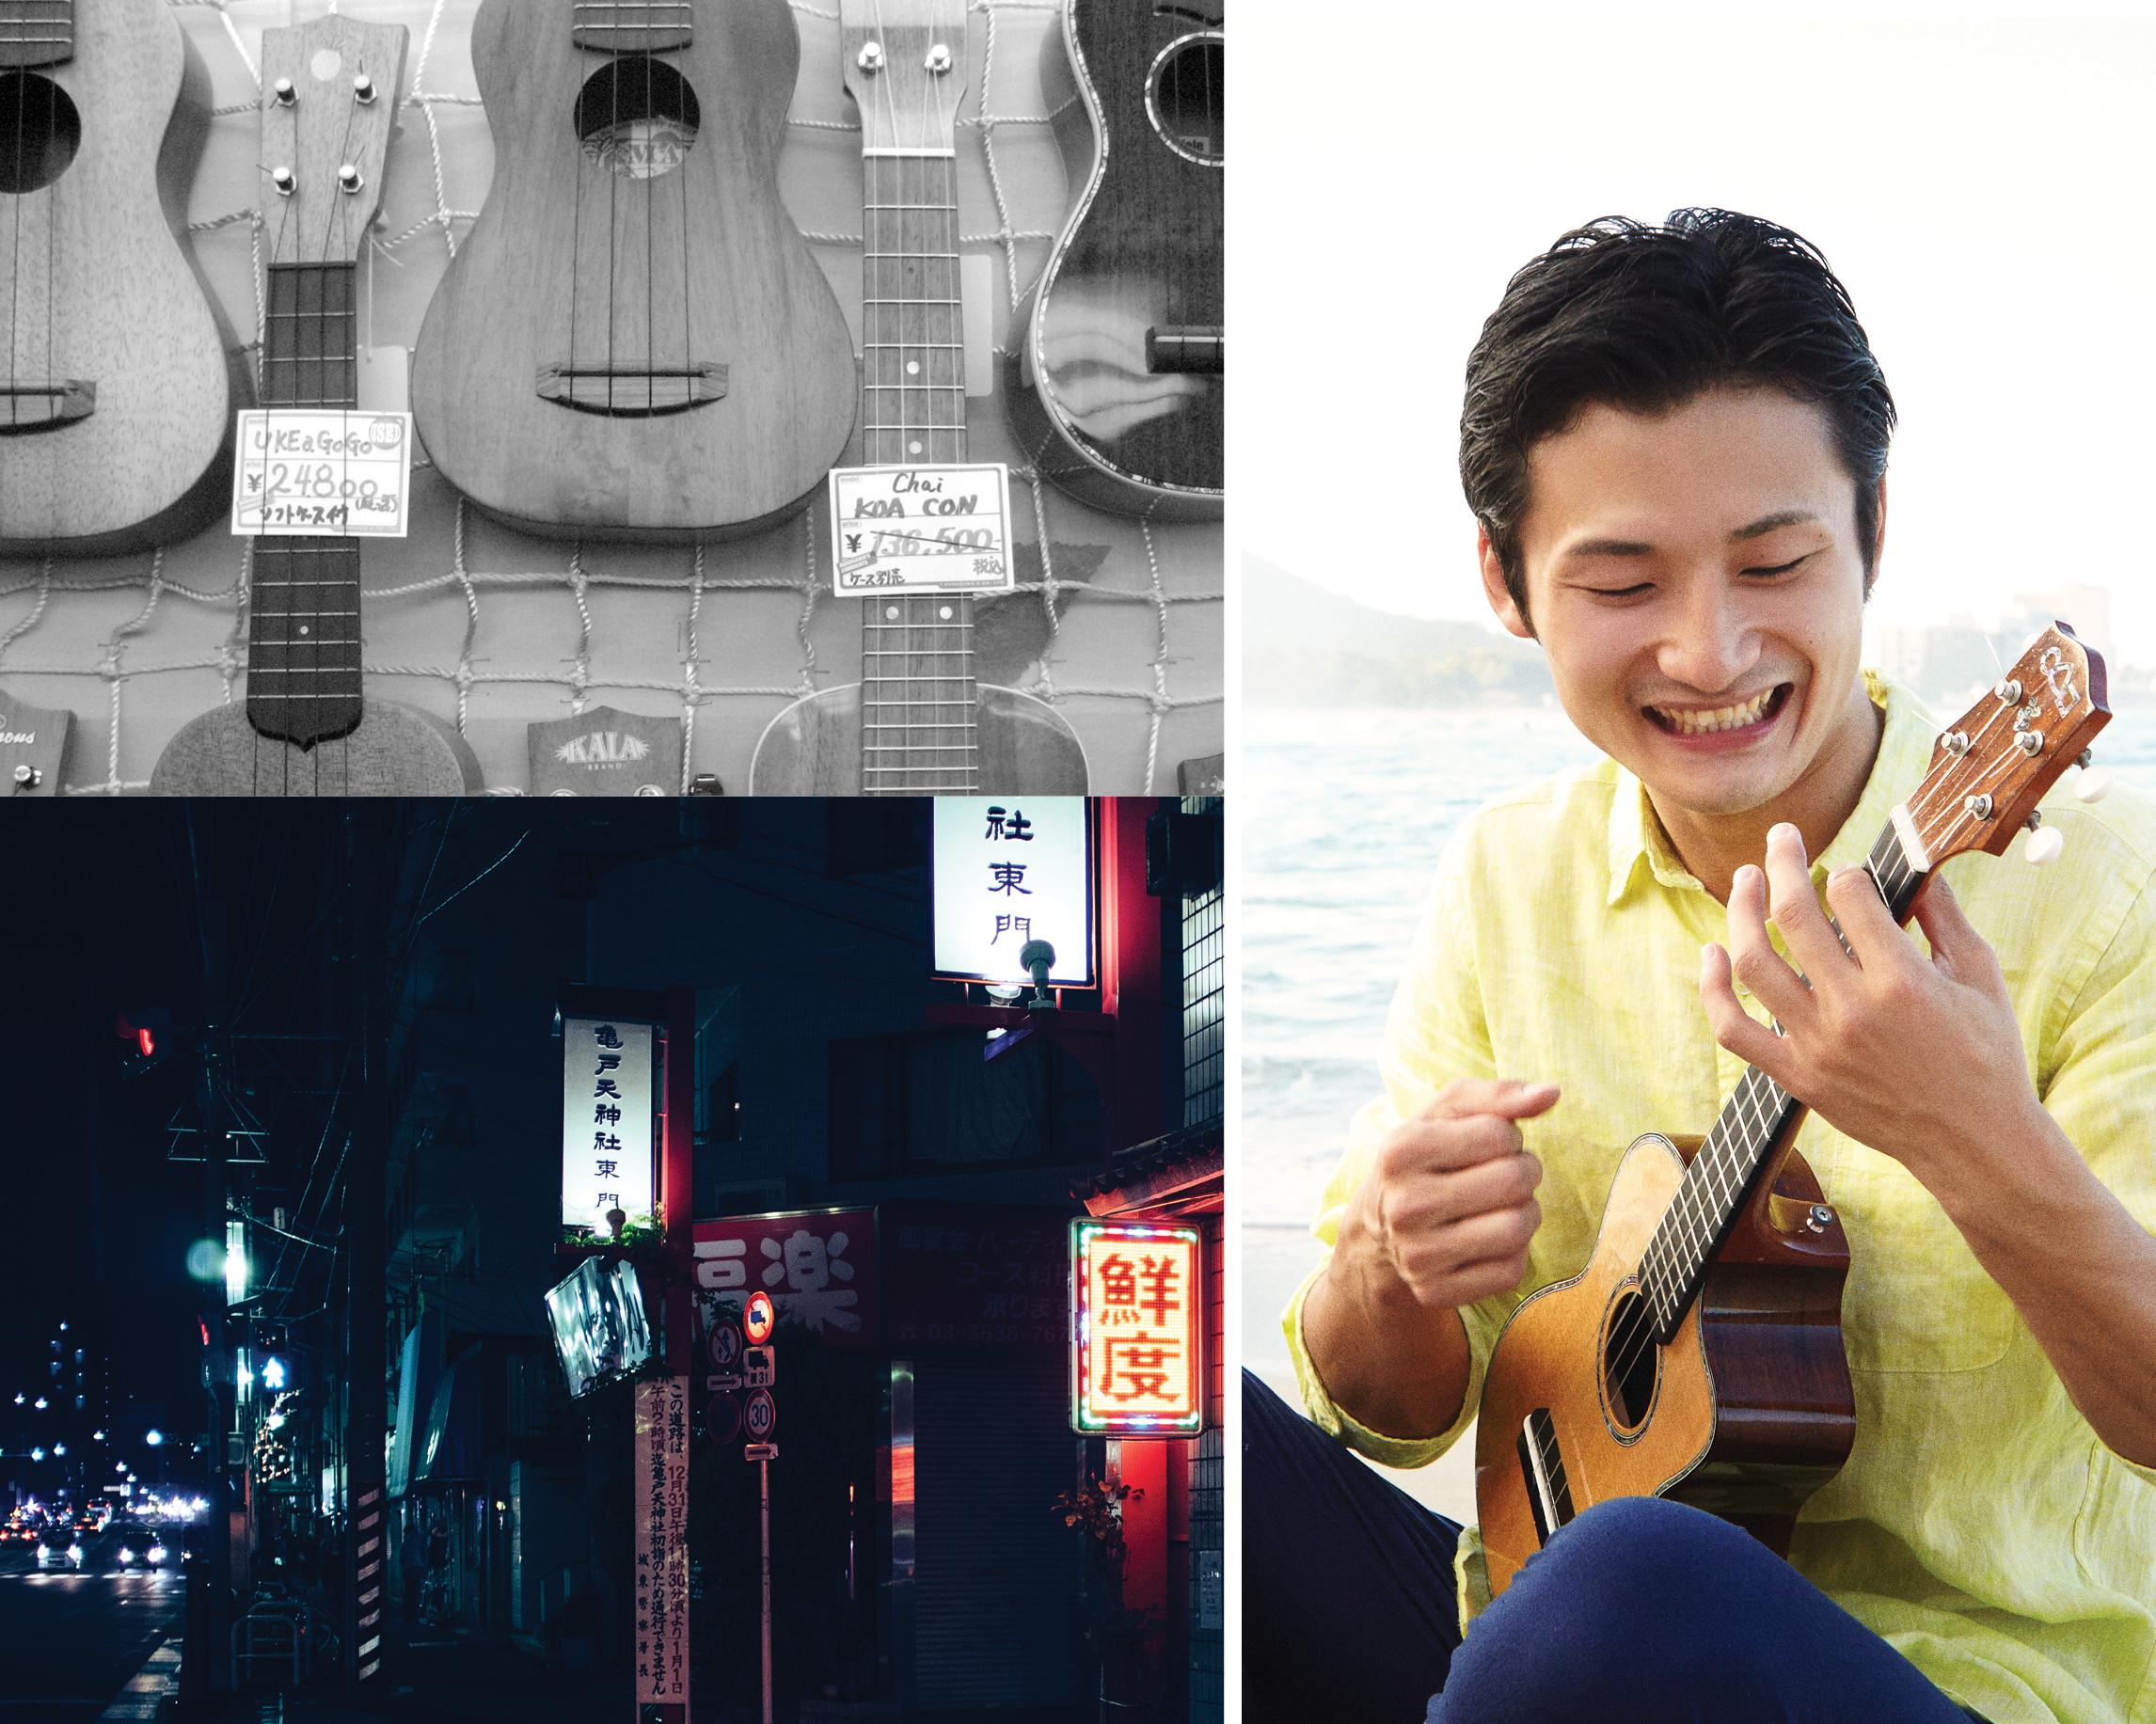 Tireless Martin Ooo-28 From Japan Guitars & Basses Musical Instruments & Gear